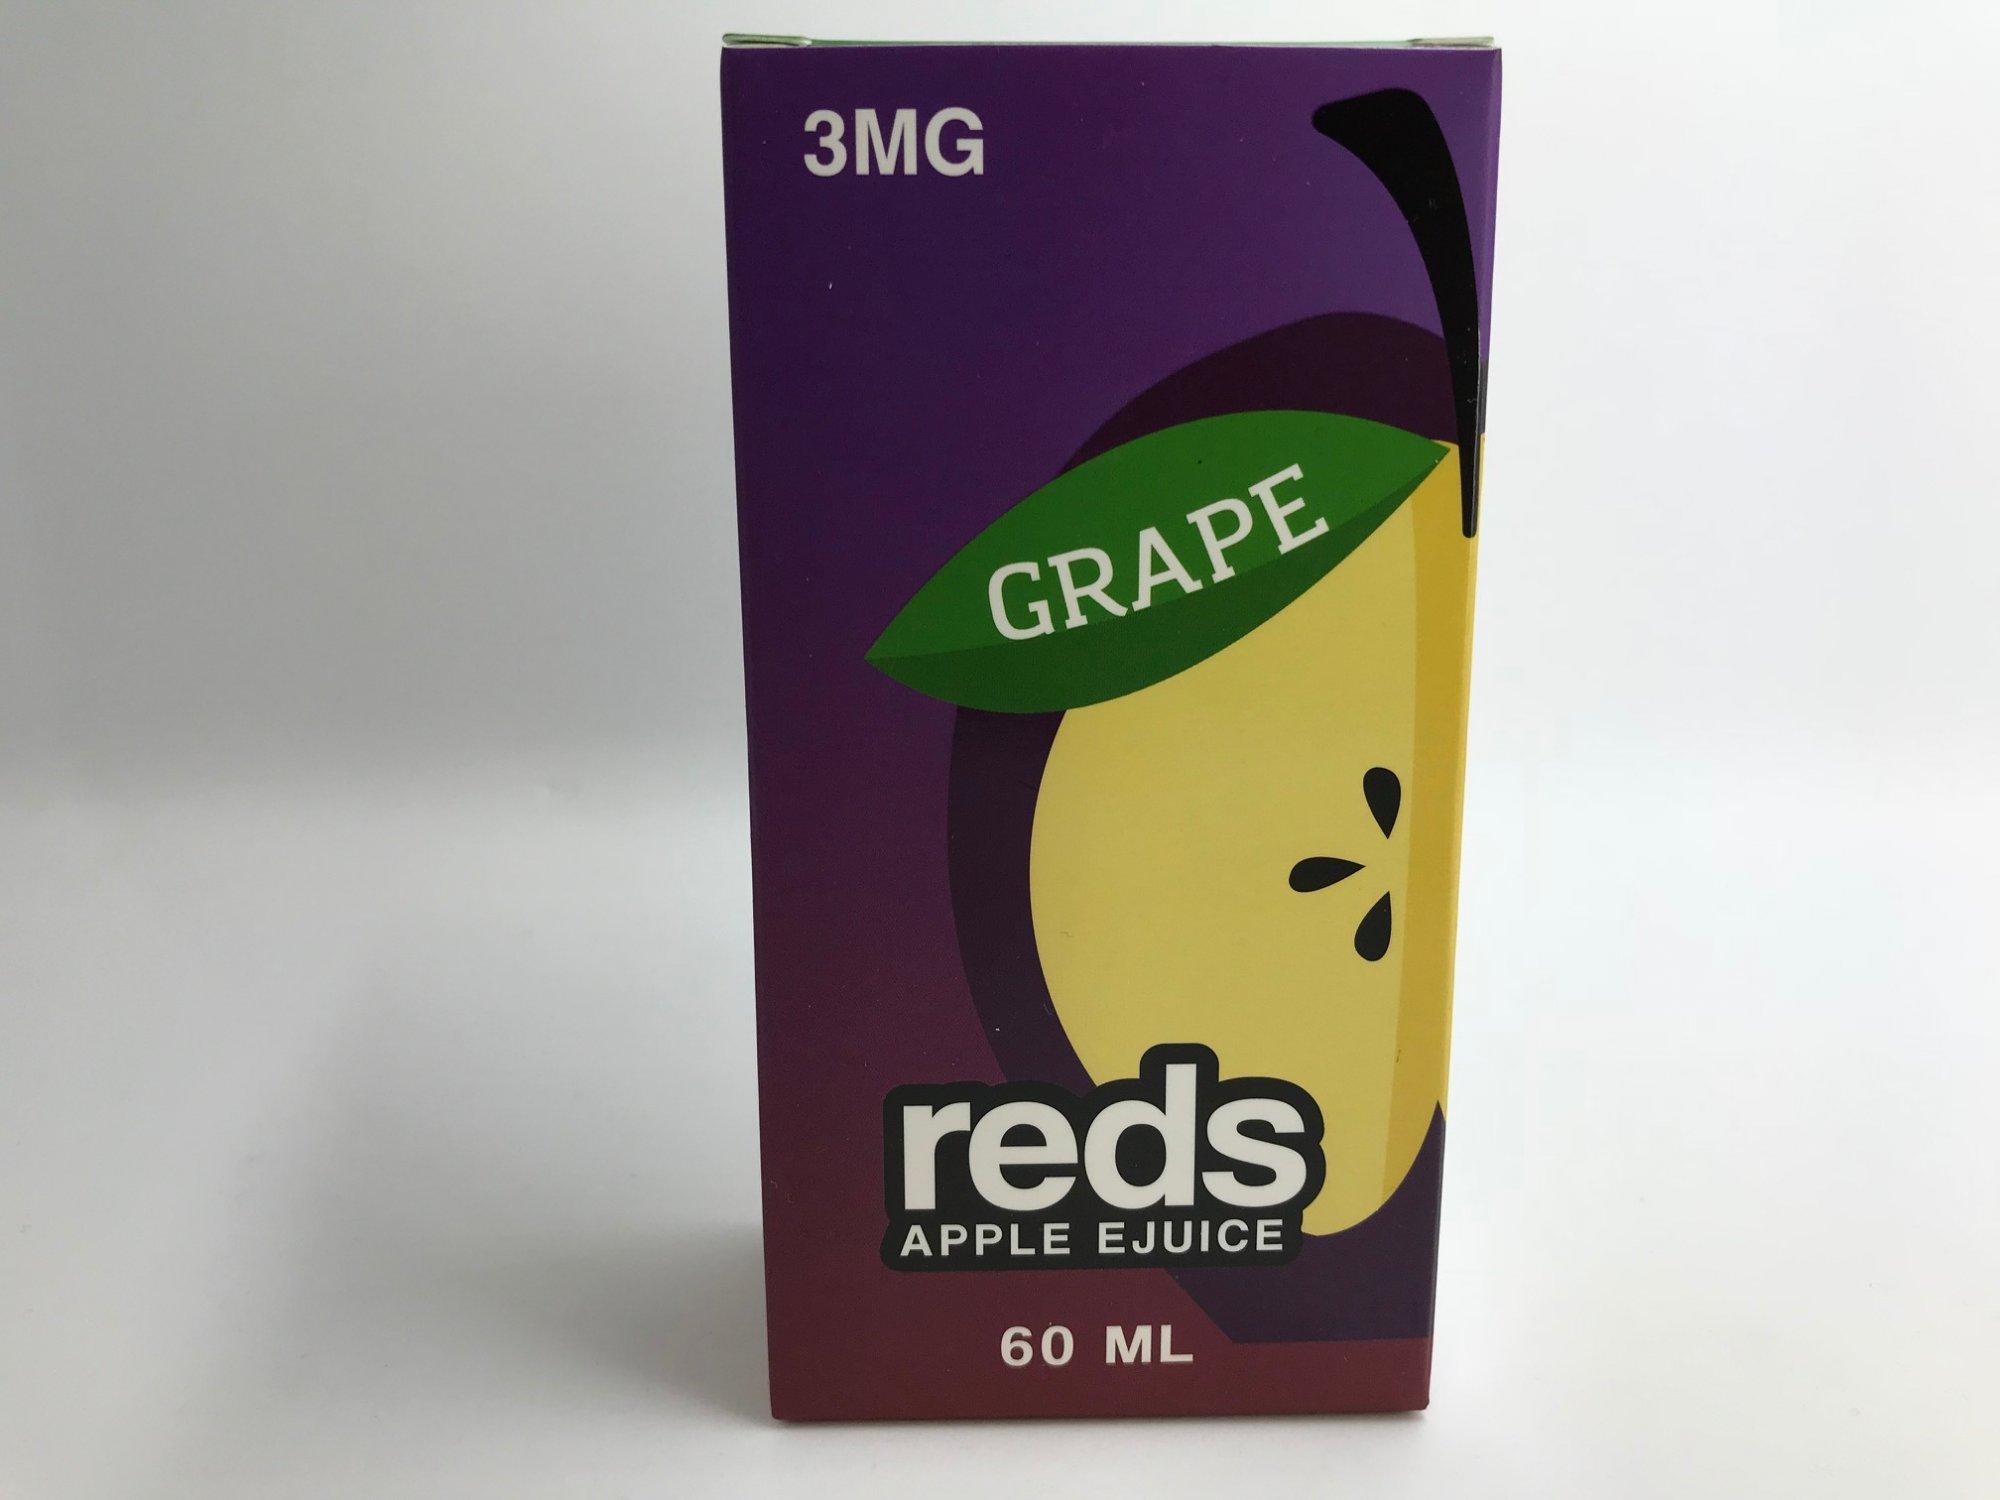 Reds Grape eJuice